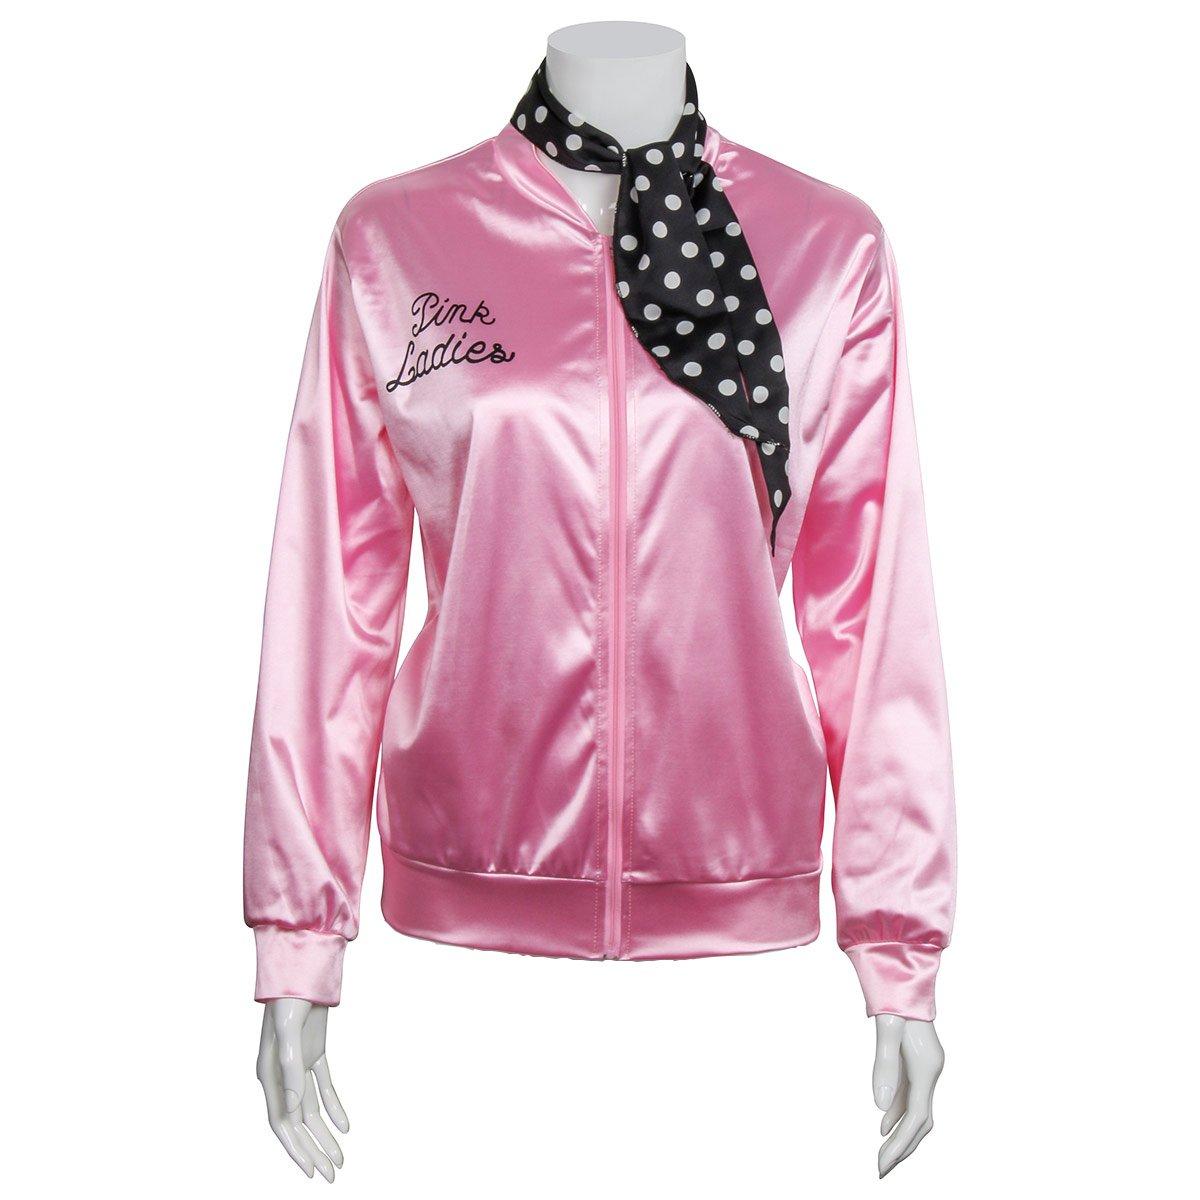 1950s Pink Satin Jacket with Neck Scarf Girls Women Danny Halloween Costume Fancy Dress (Medium)